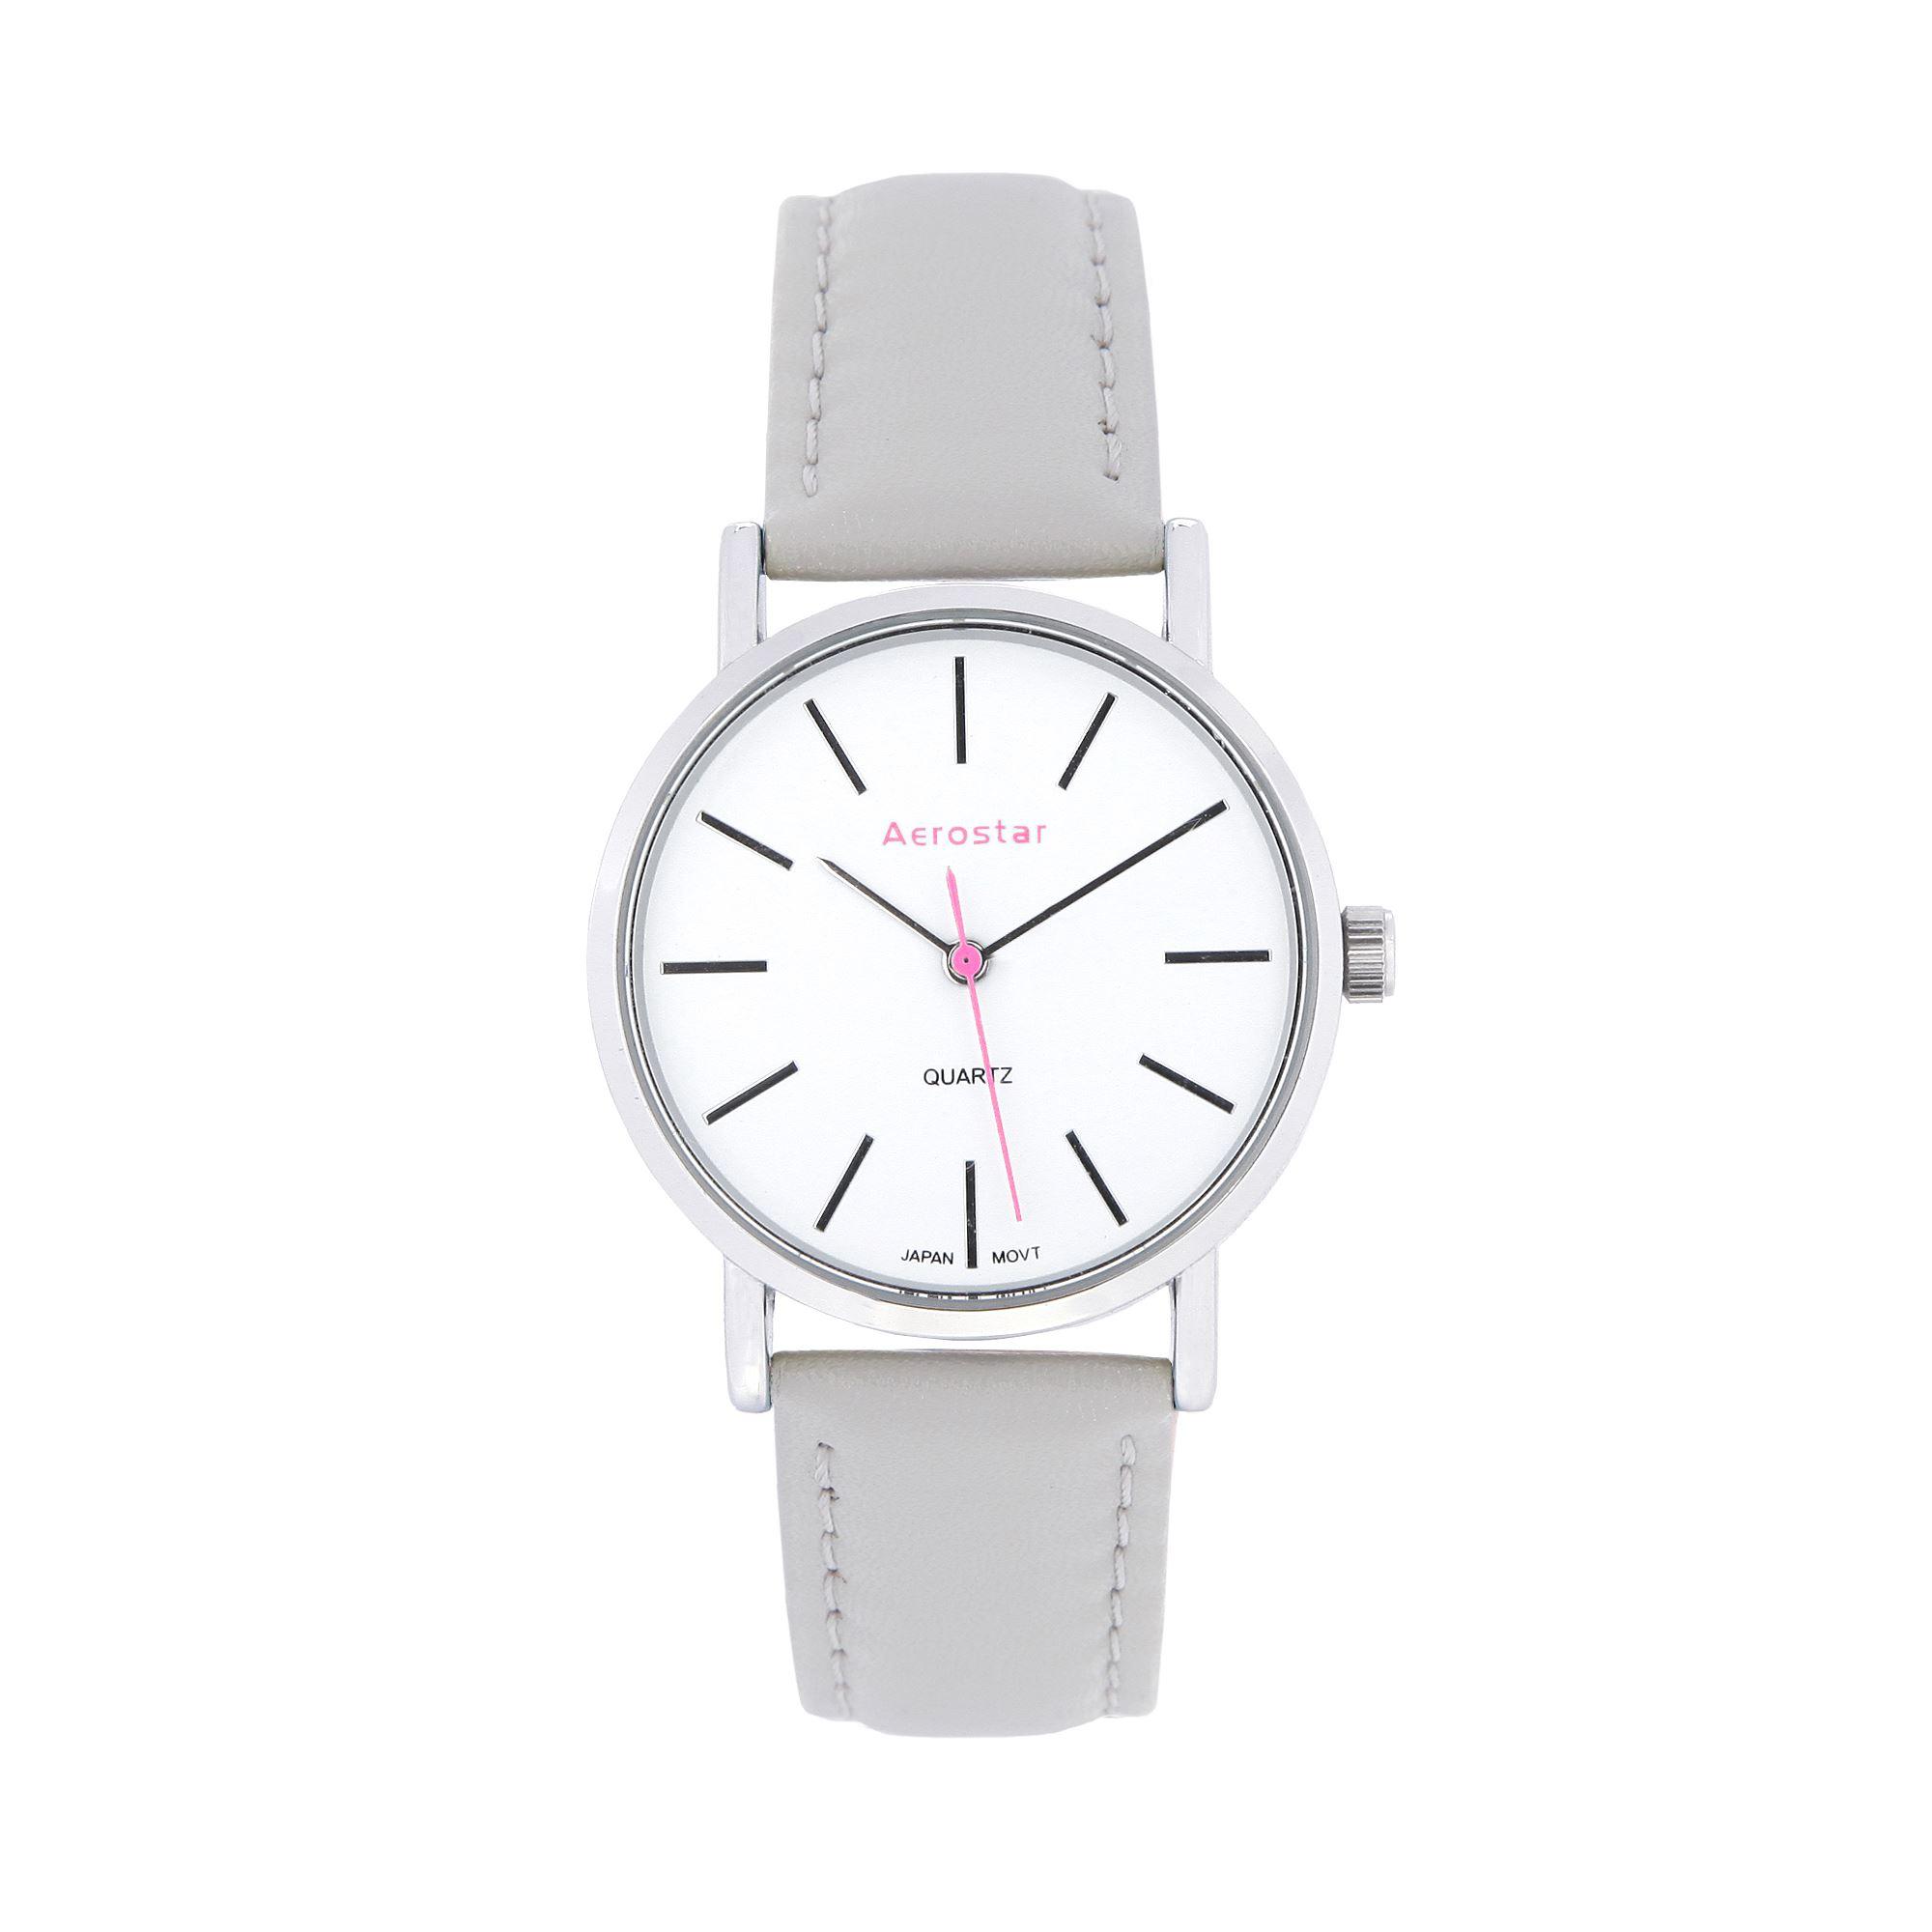 Aerostar - Reloj Dama 6618001 gris  6fd798228ab0